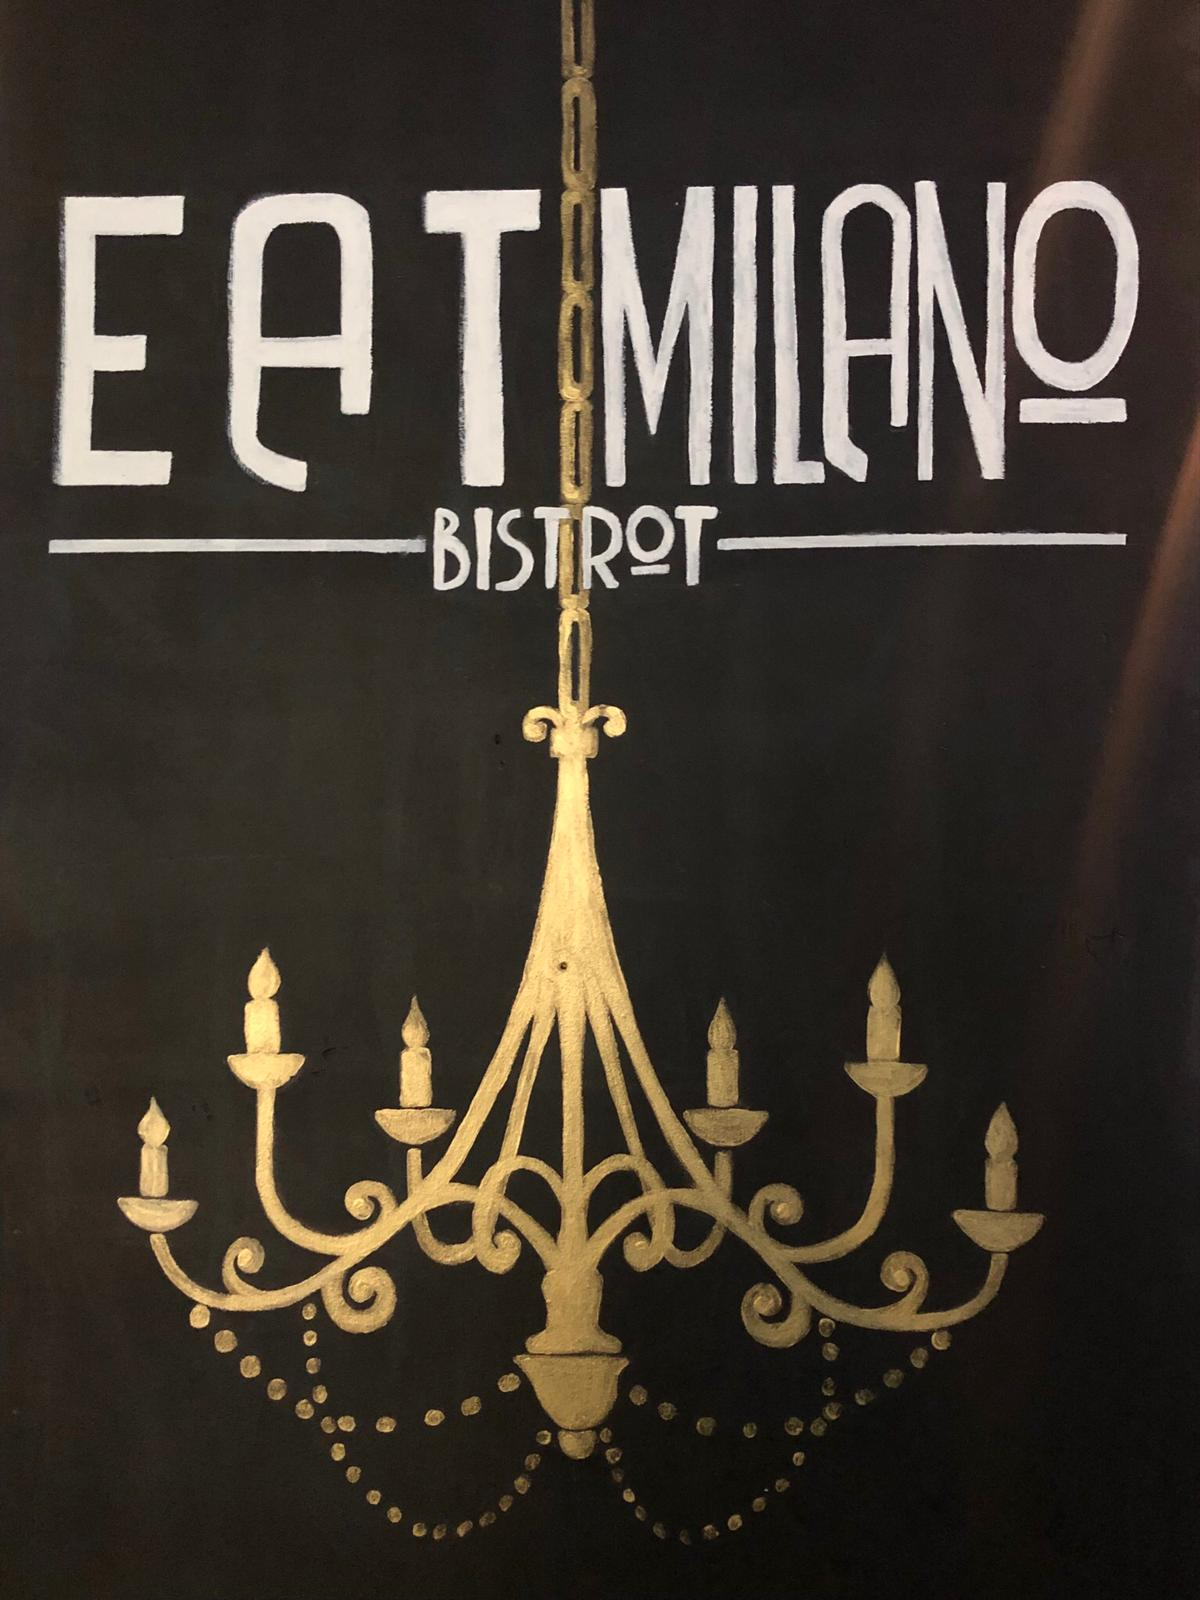 eat milano (E@T milano ) bistrot eat milano